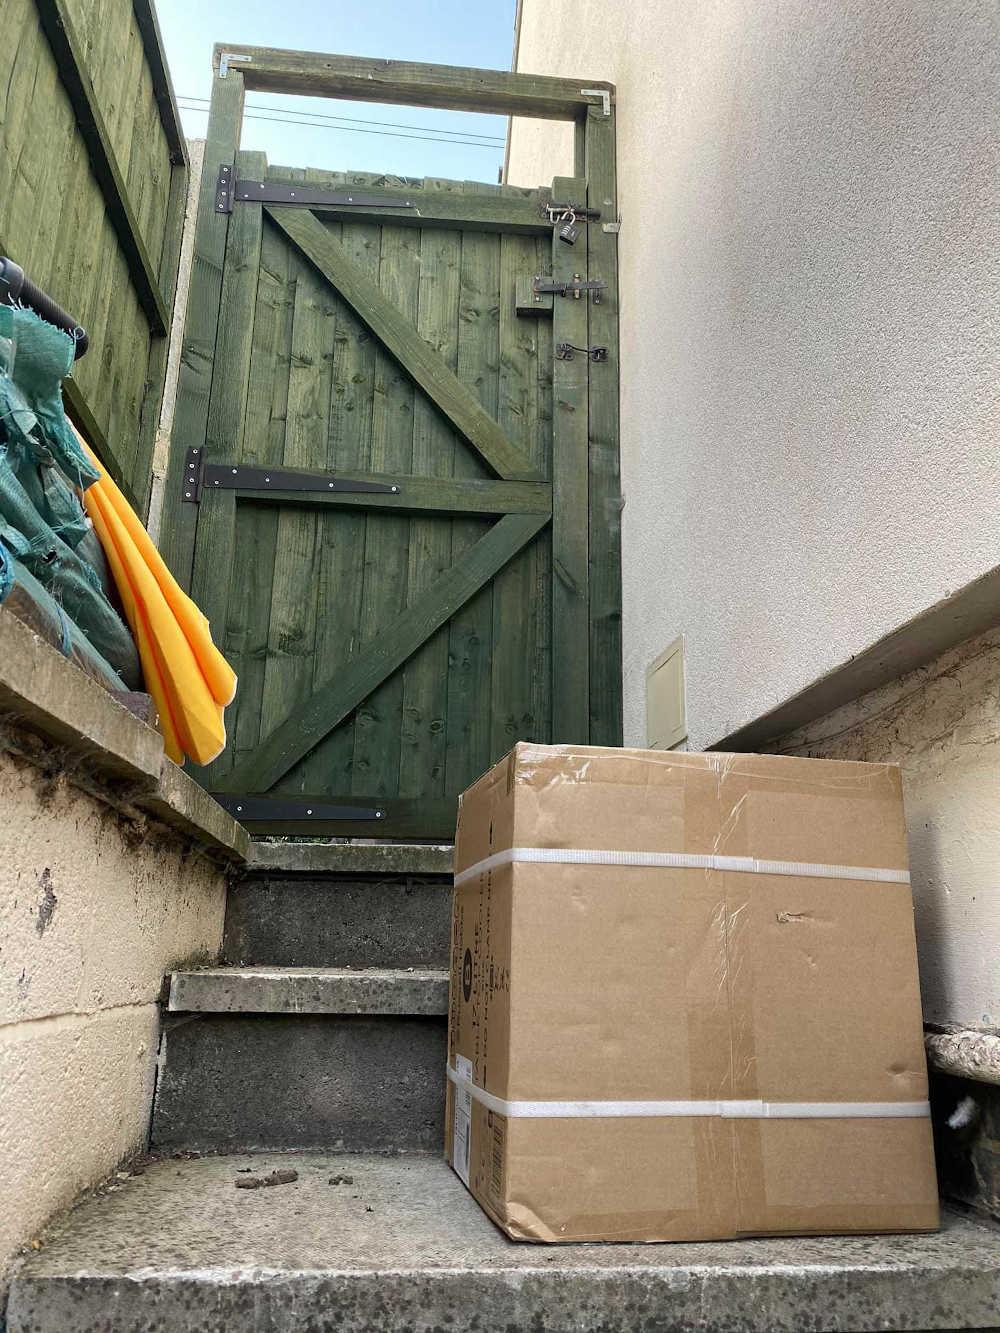 Parcel behind fence